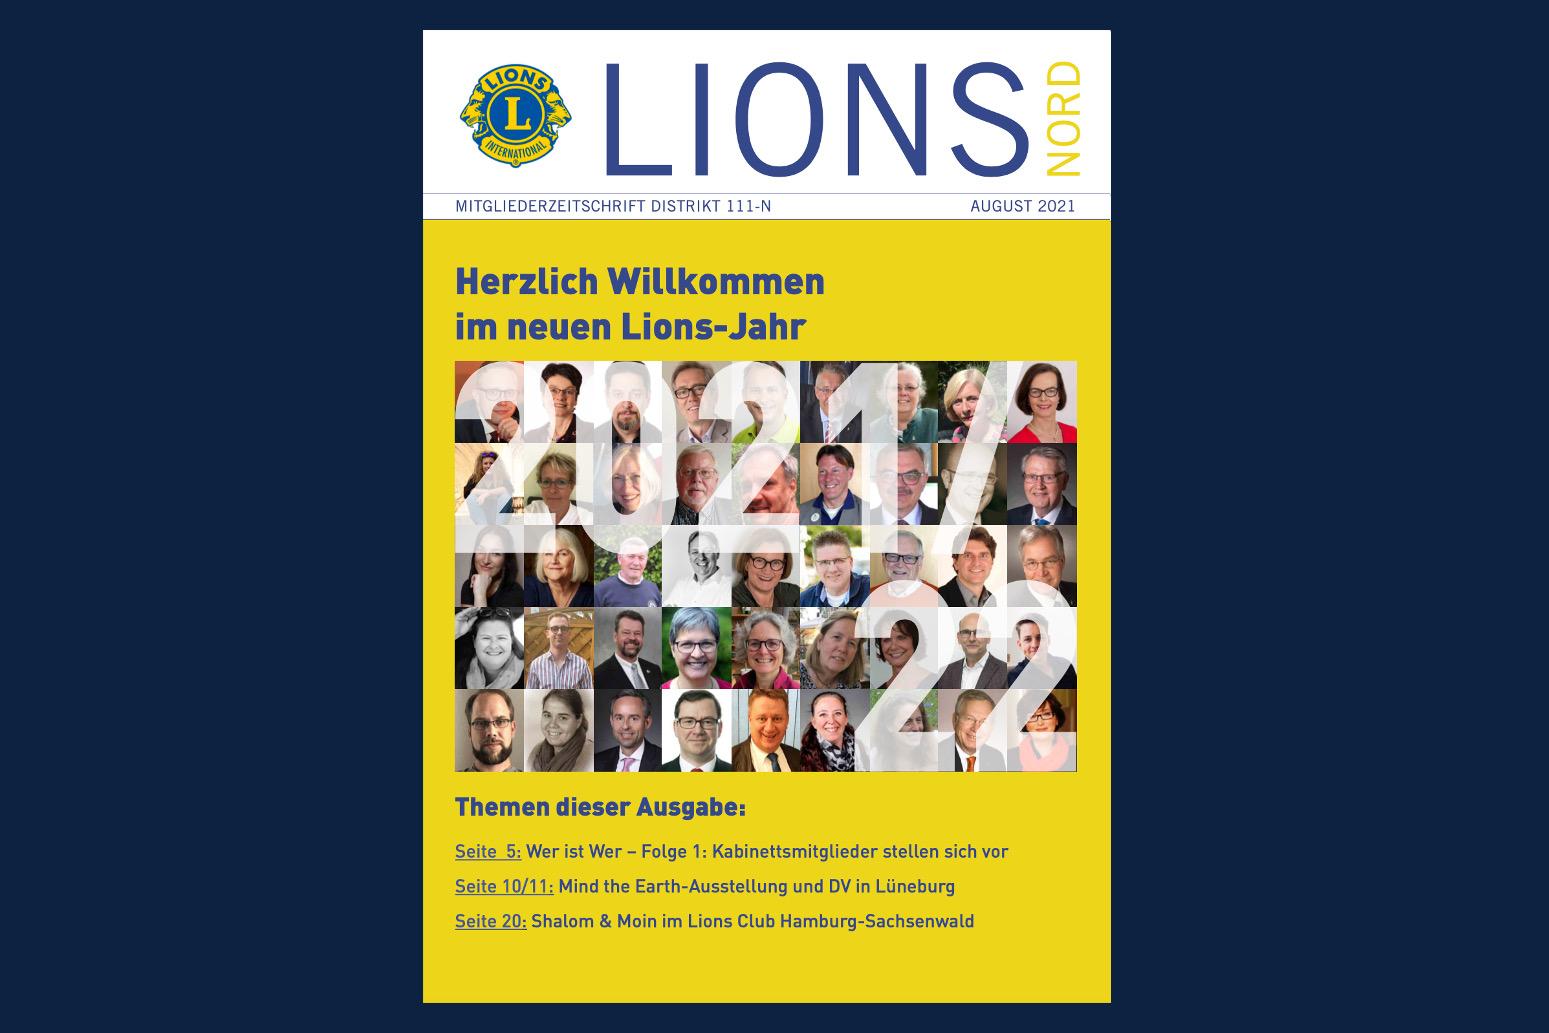 Deckblatt des Lions Nord Newsletters